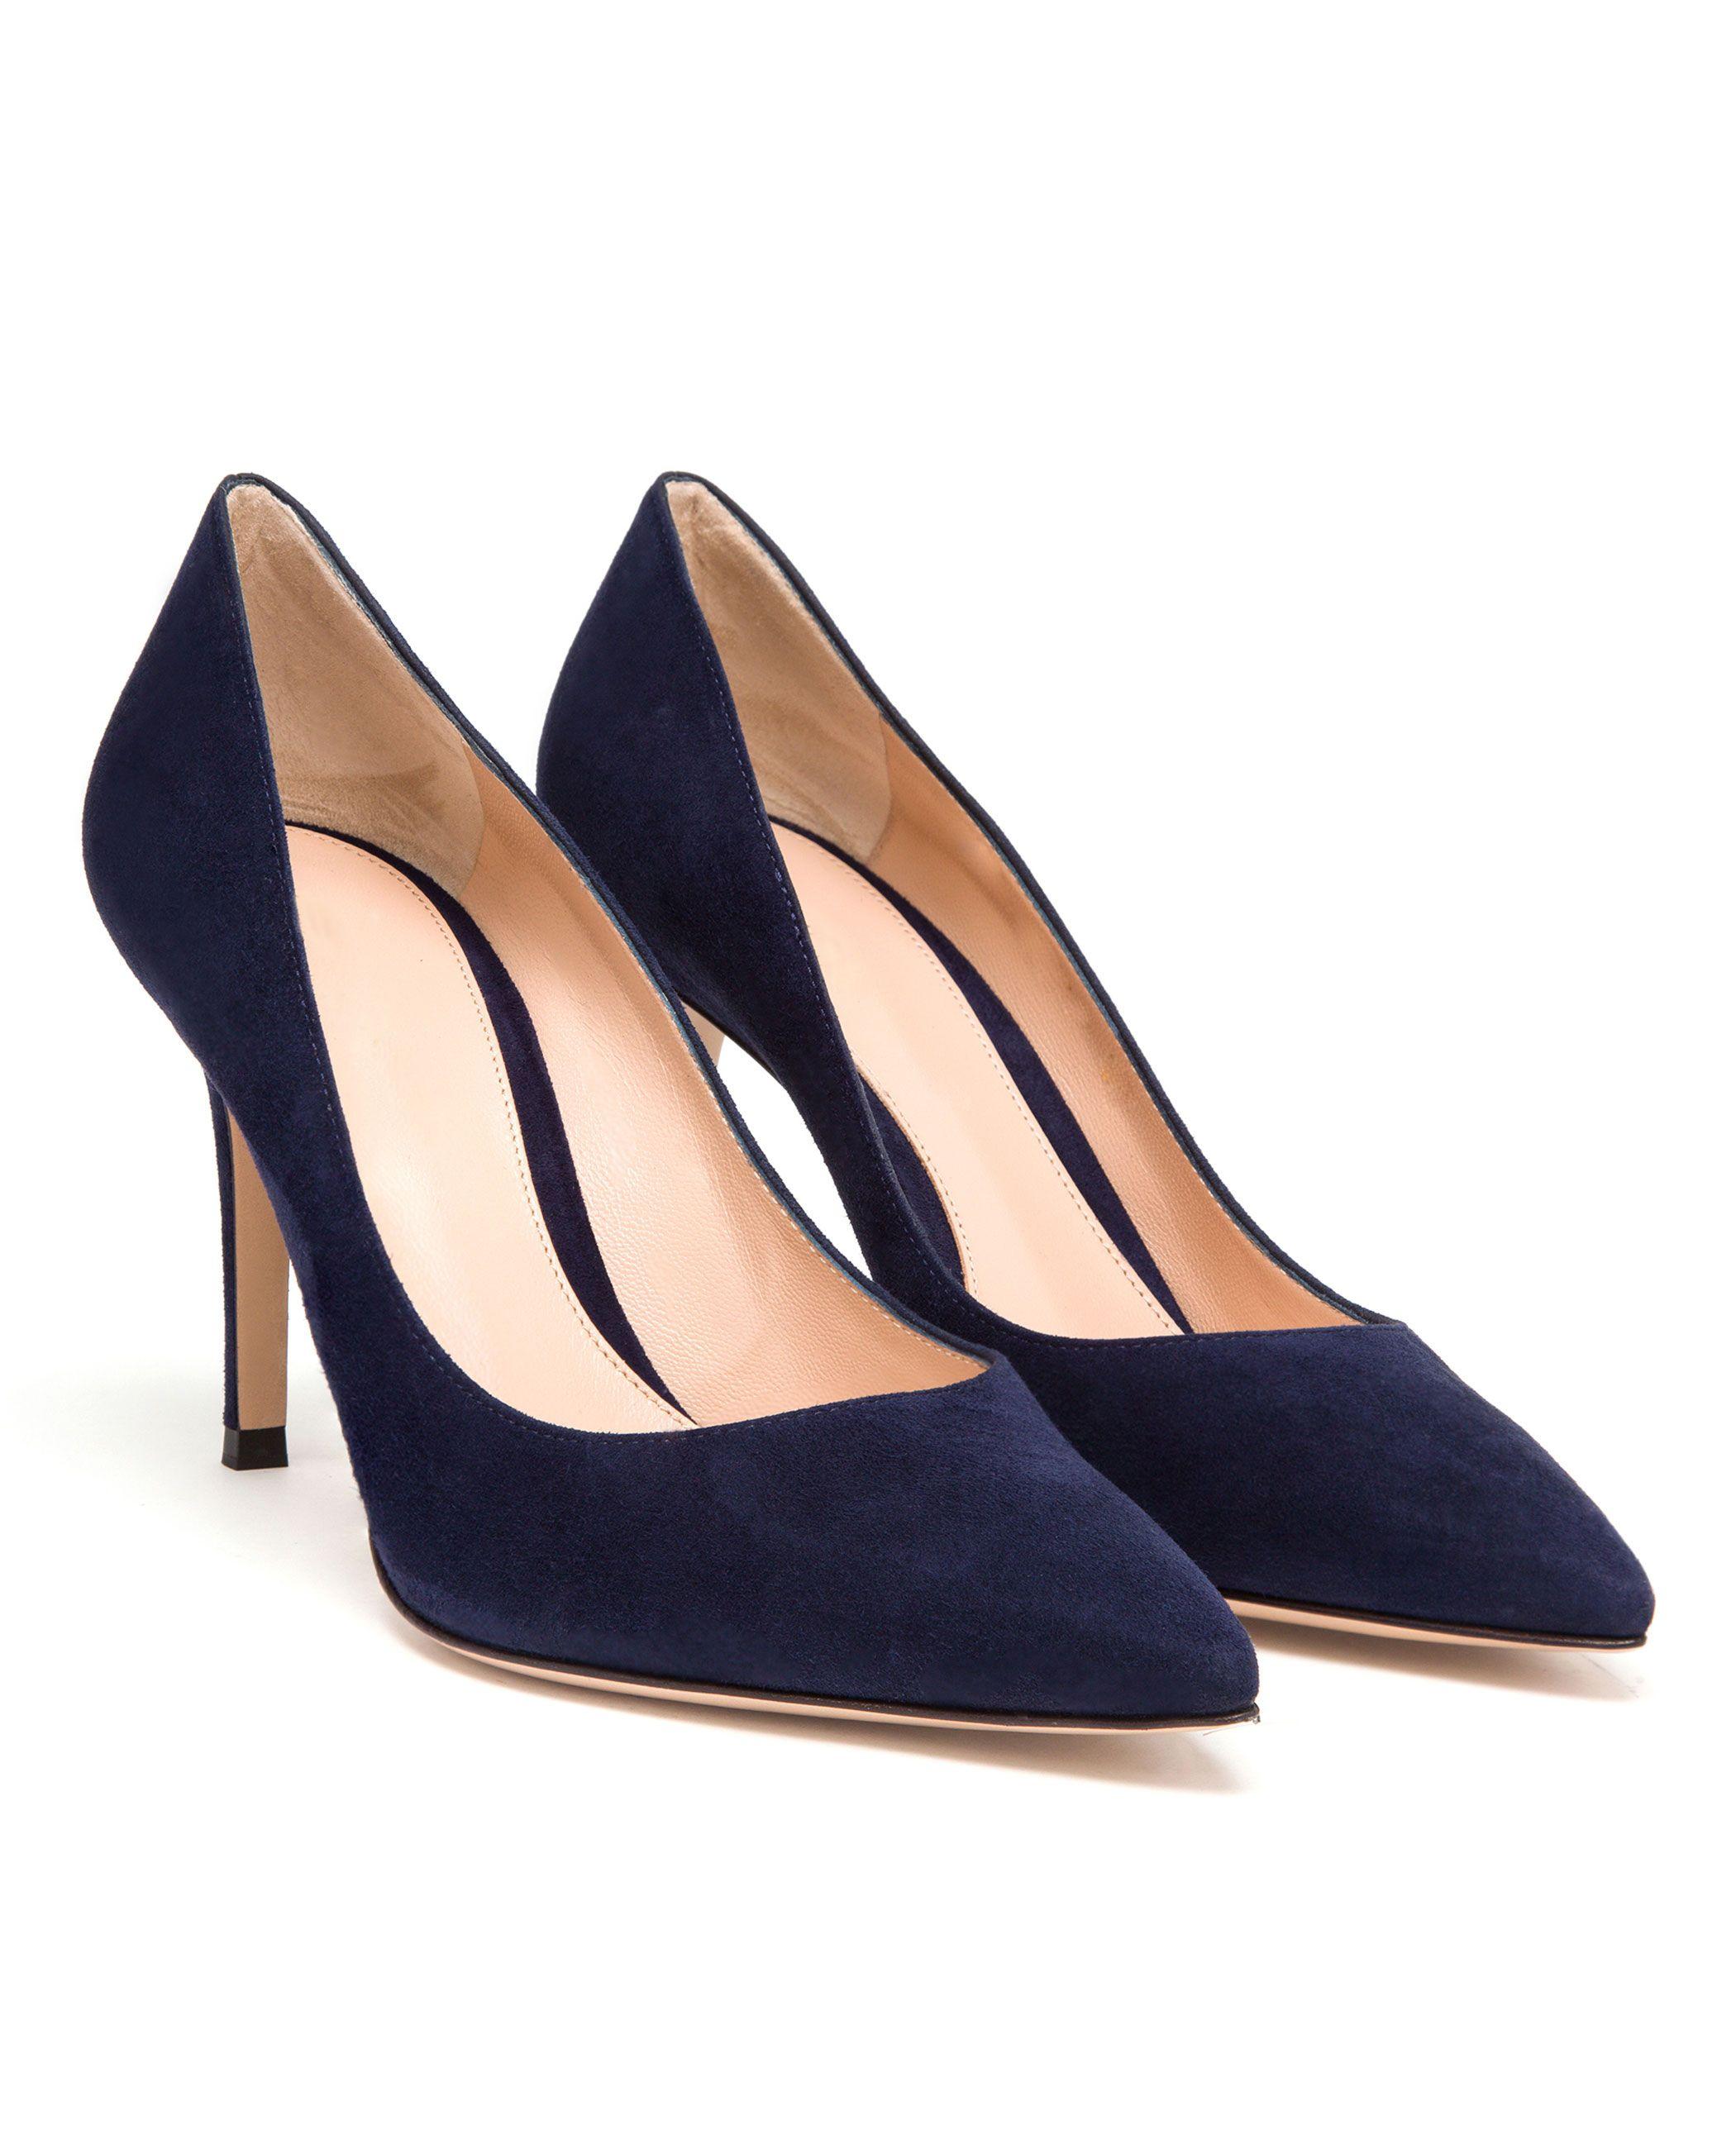 Zandina Ladies Handmade Fashion Slip On 85mm Pointy Basic Office Party Prom High Heel Pumps Shoes Dark Purple K372